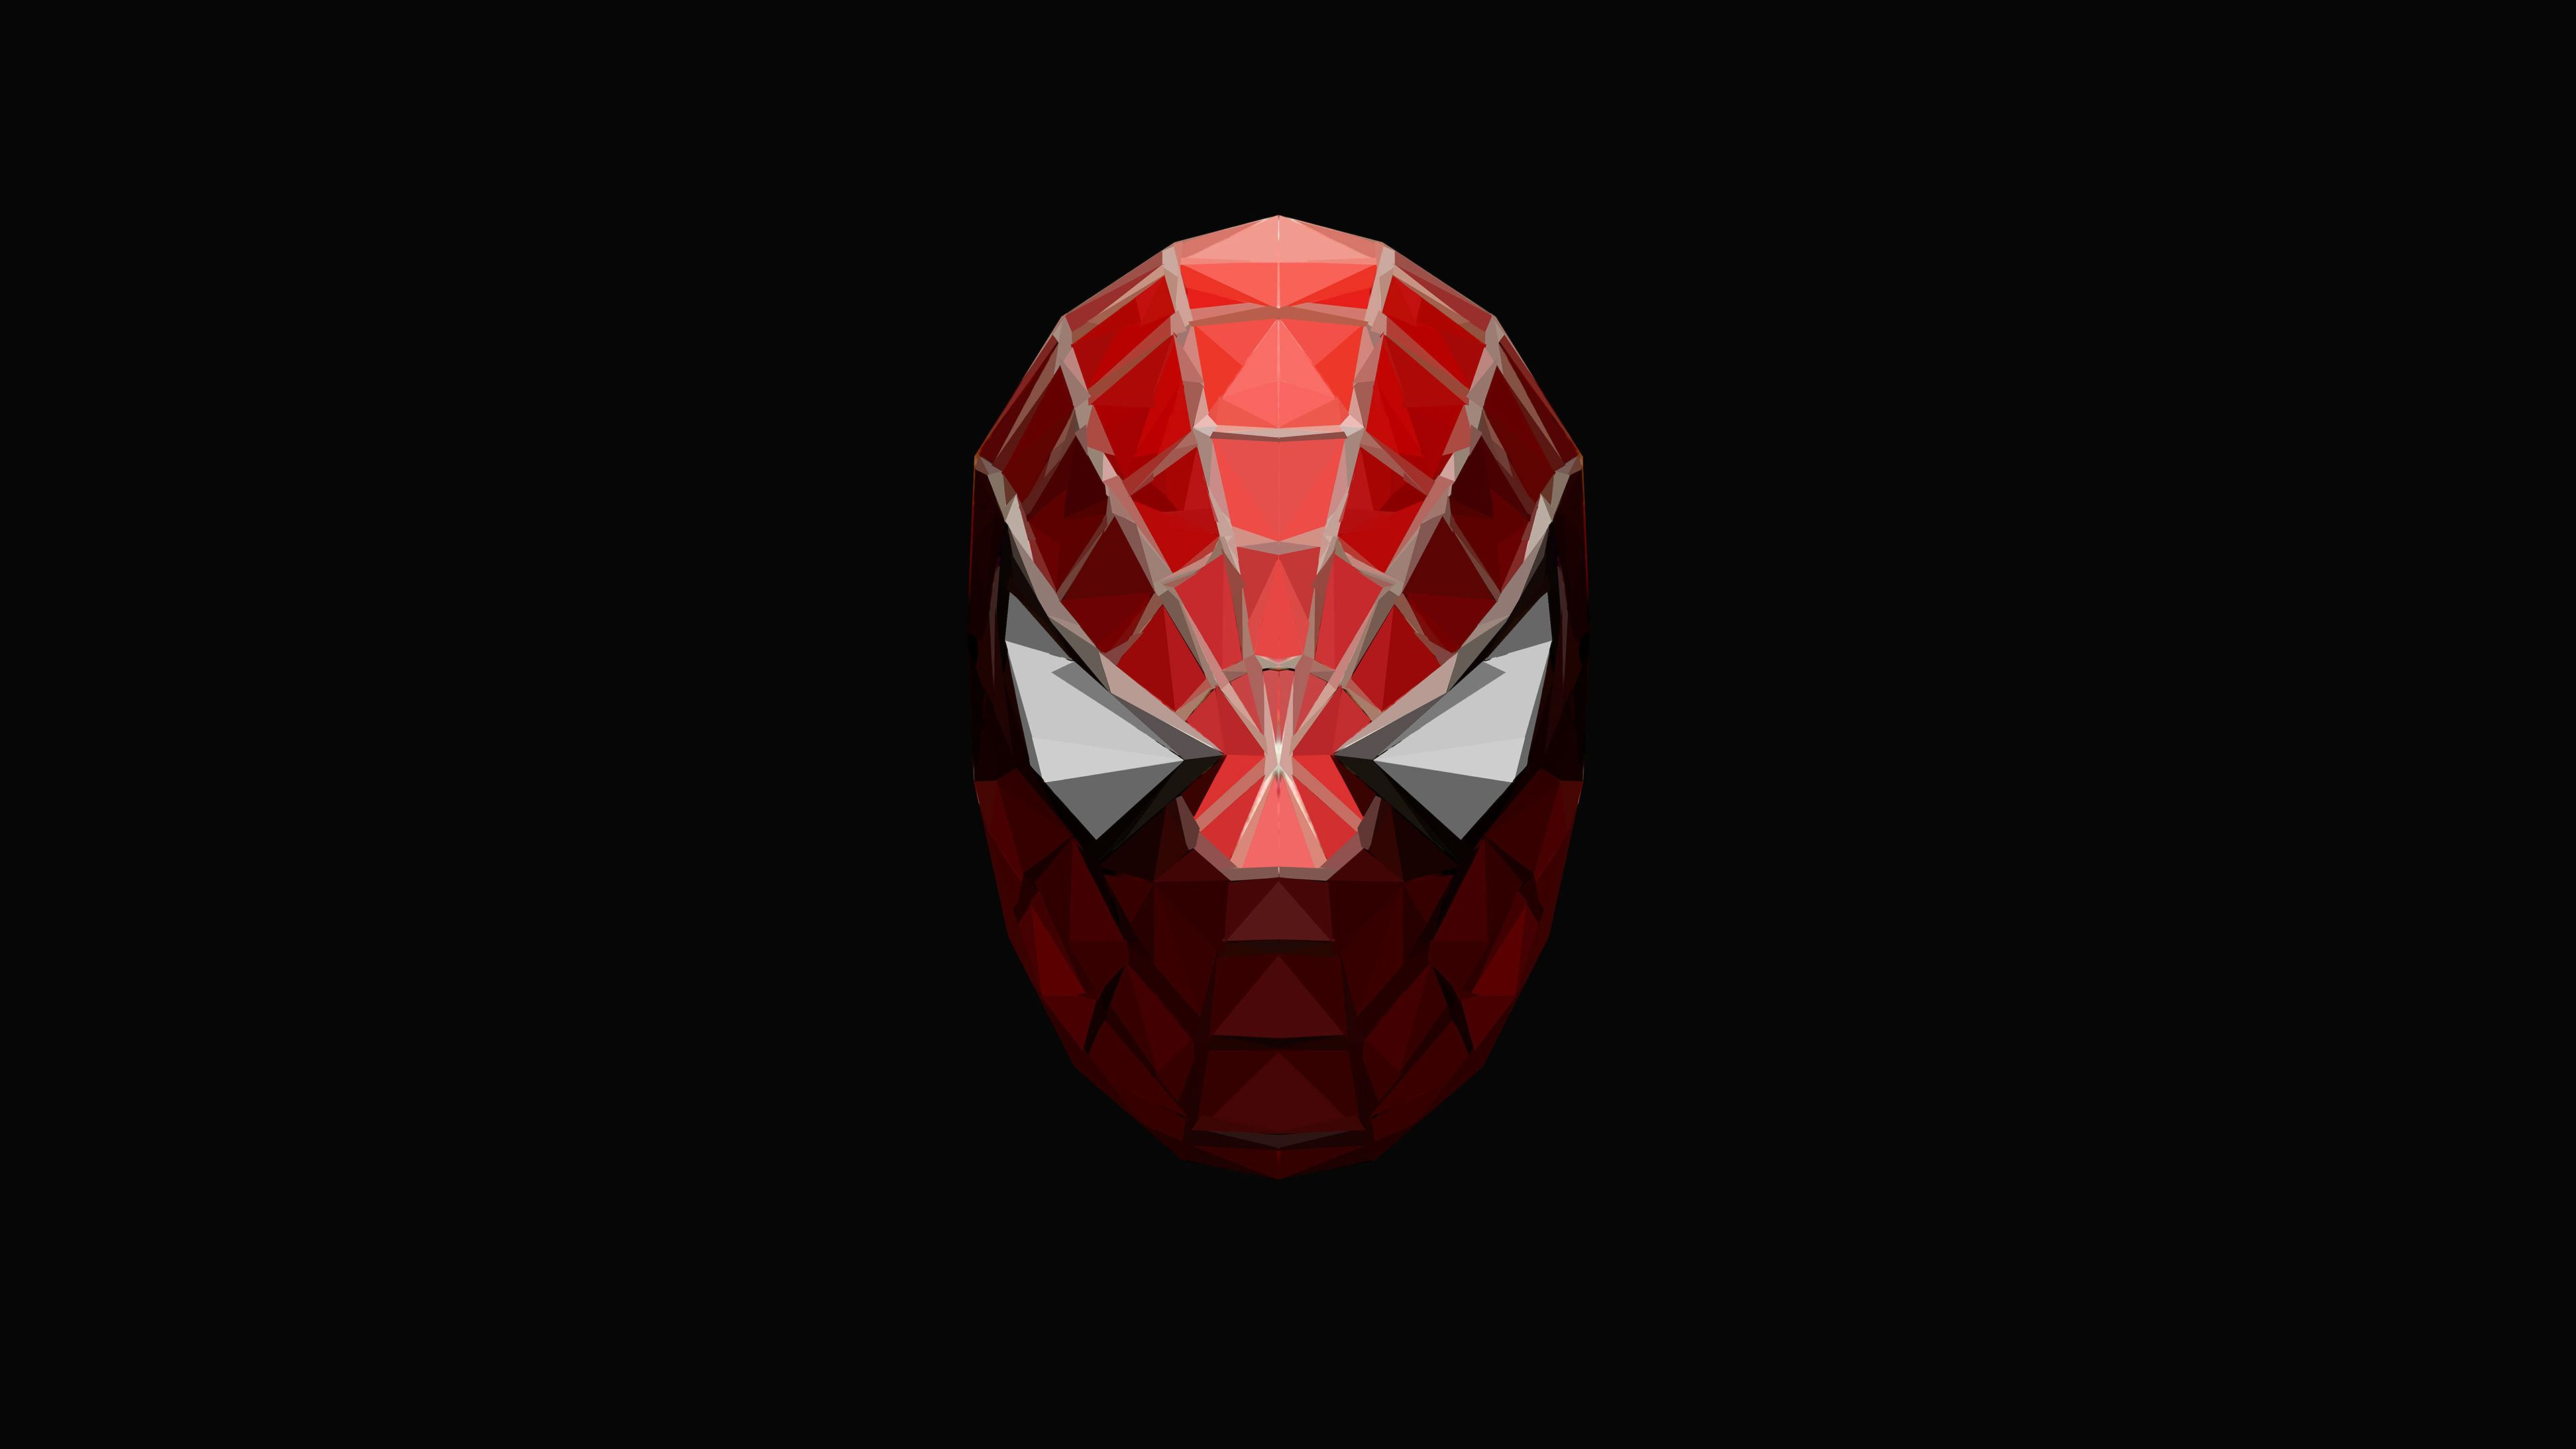 Spiderman Low Poly Art 4k Superheroes Wallpapers Spiderman Wallpapers Low Poly Wallpapers Hd Wallpapers Digital Art Wa Spiderman Low Poly Art Art Wallpaper